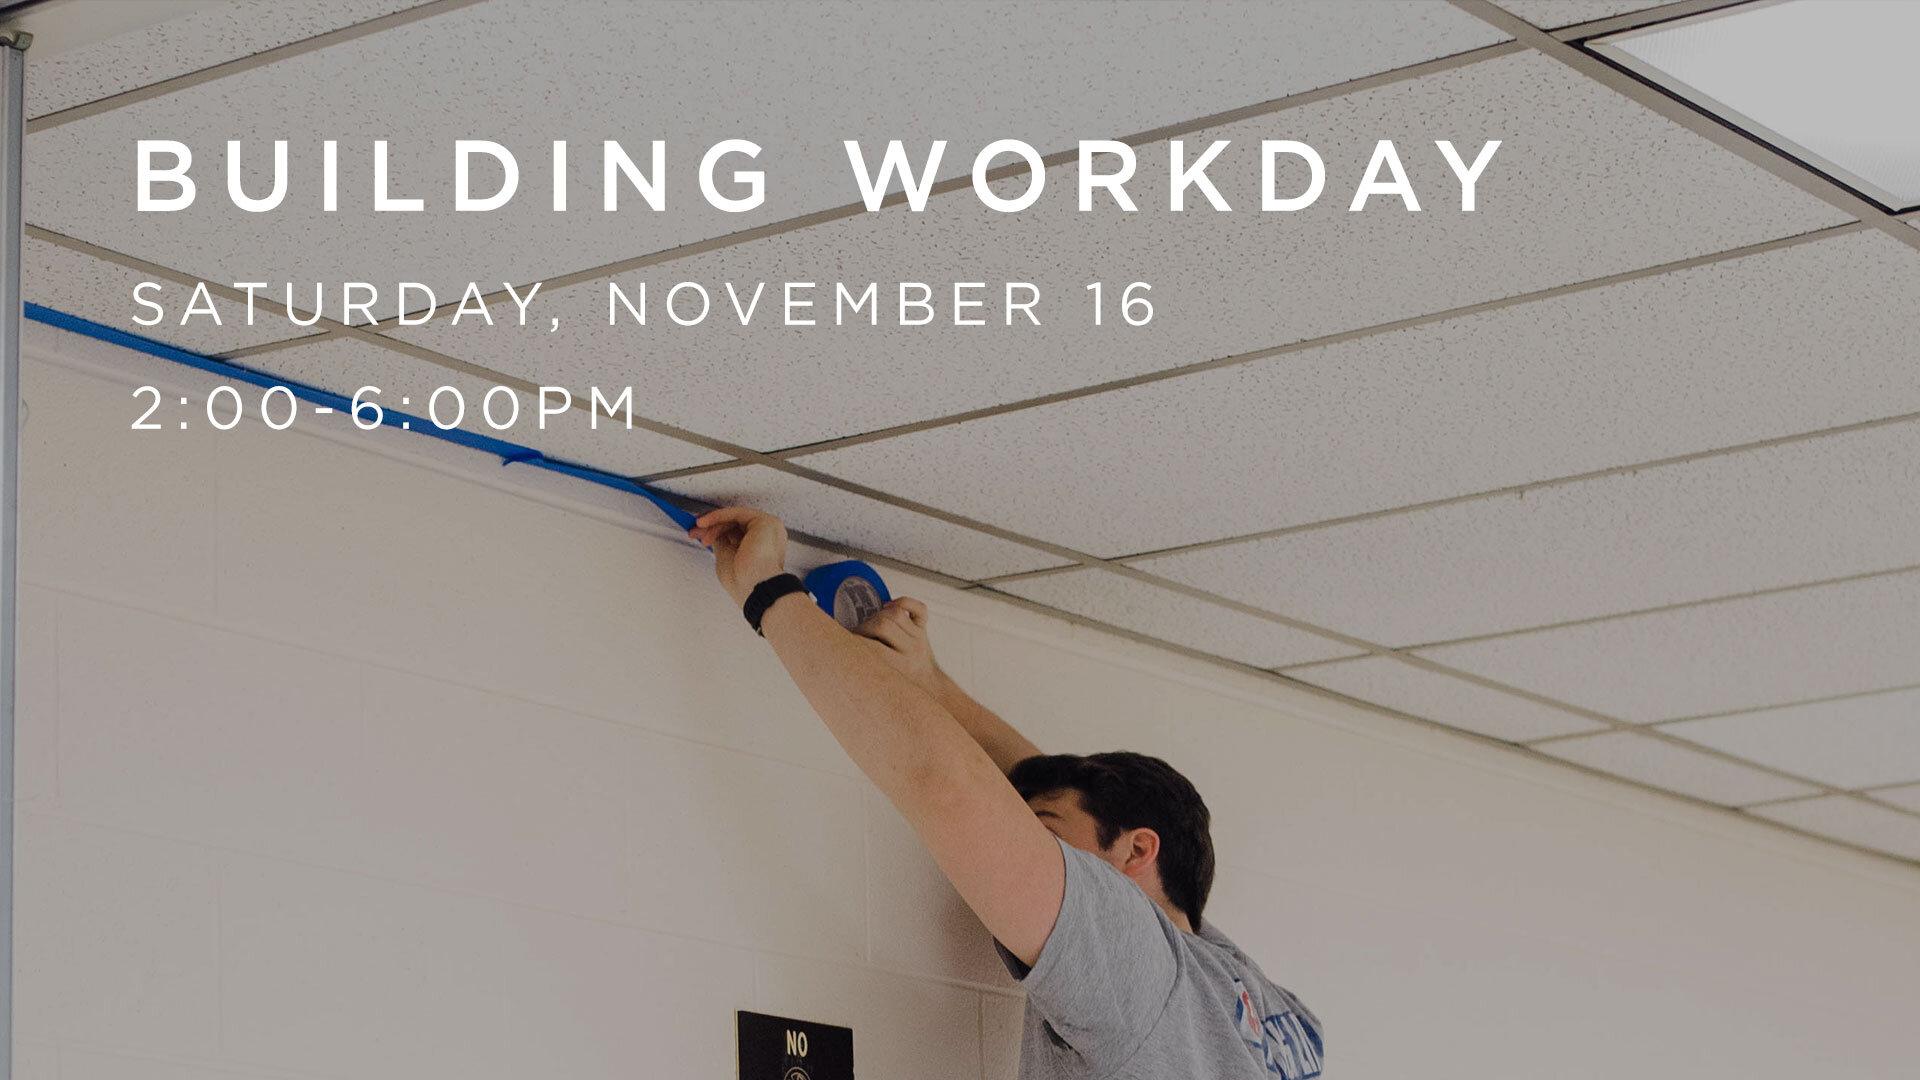 building-workday-header.jpg